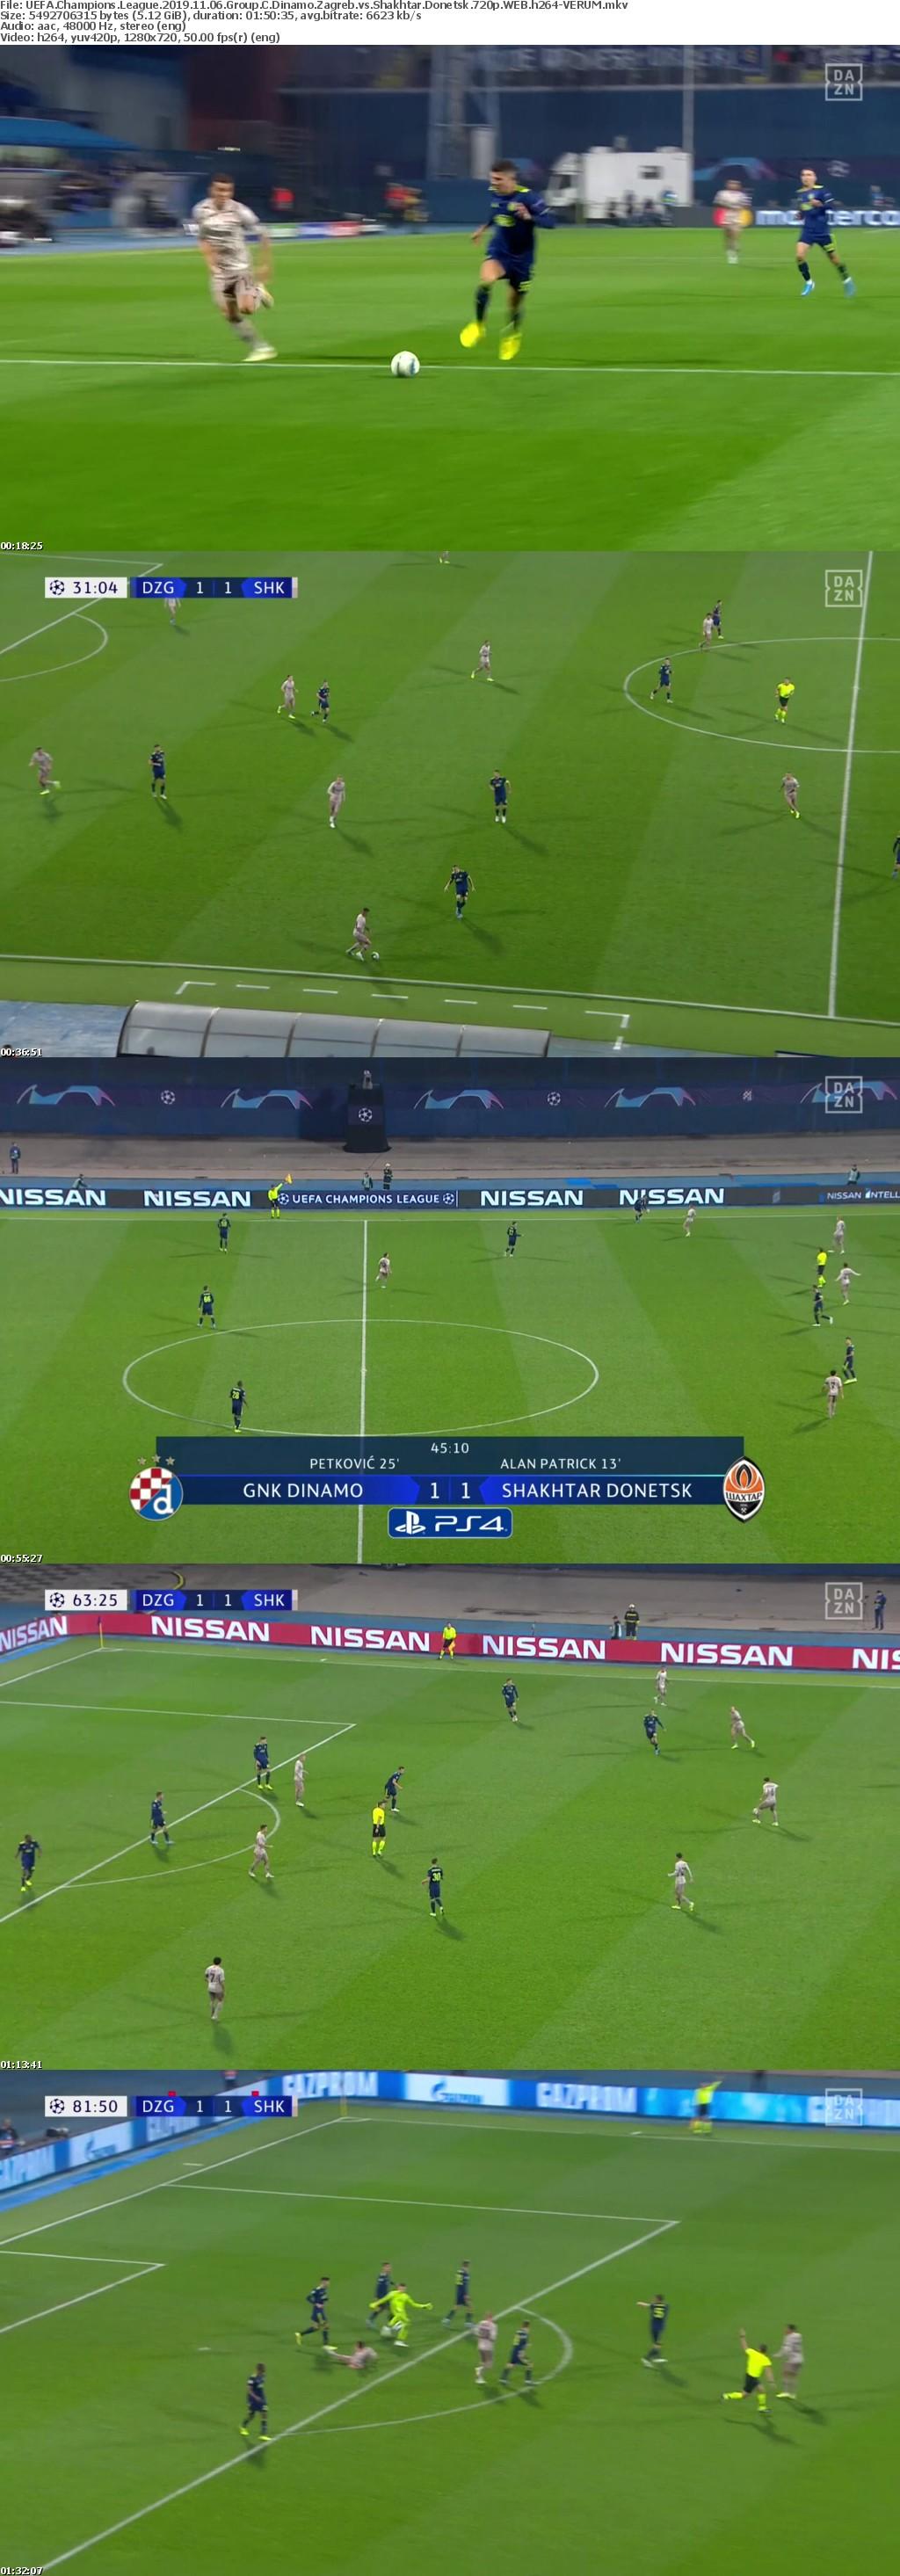 UEFA Champions League 2019 11 06 Group C Dinamo Zagreb vs Shakhtar Donetsk 720p WEB h264-VERUM